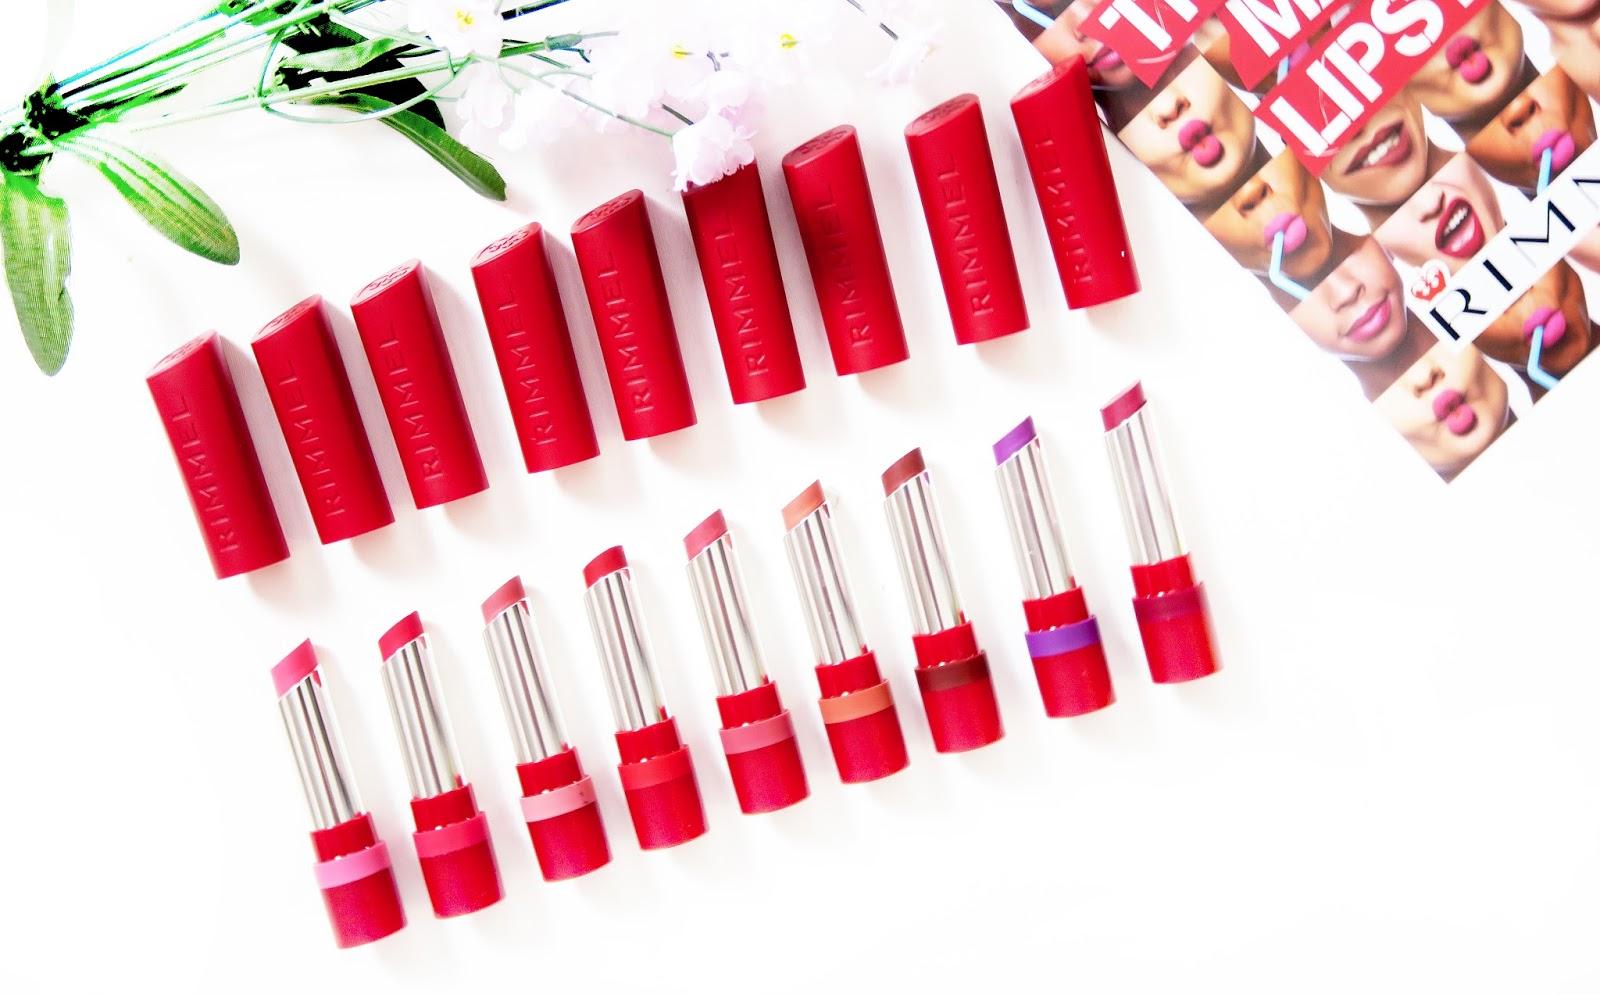 Image of Rimmel Only 1 Matte Lipstick